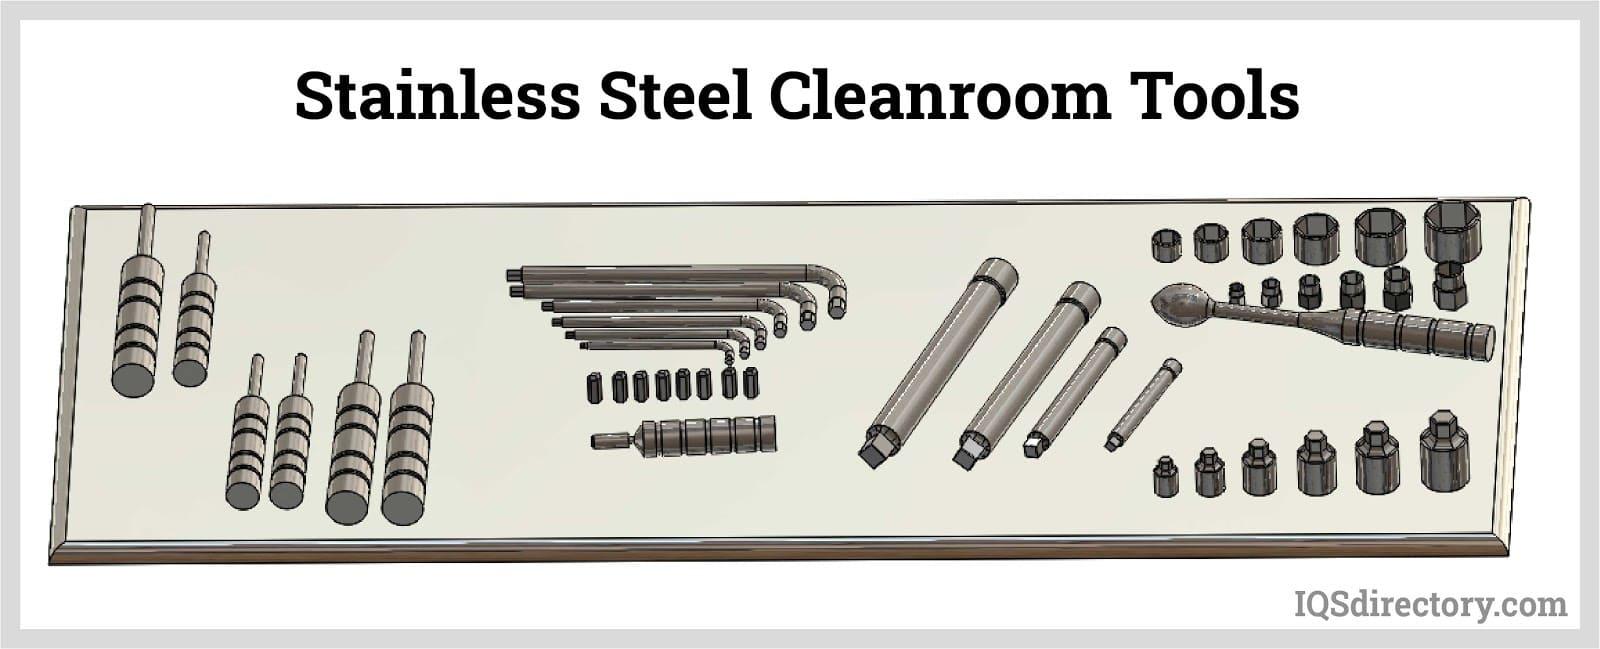 Stainless Steel Cleanroom Tools